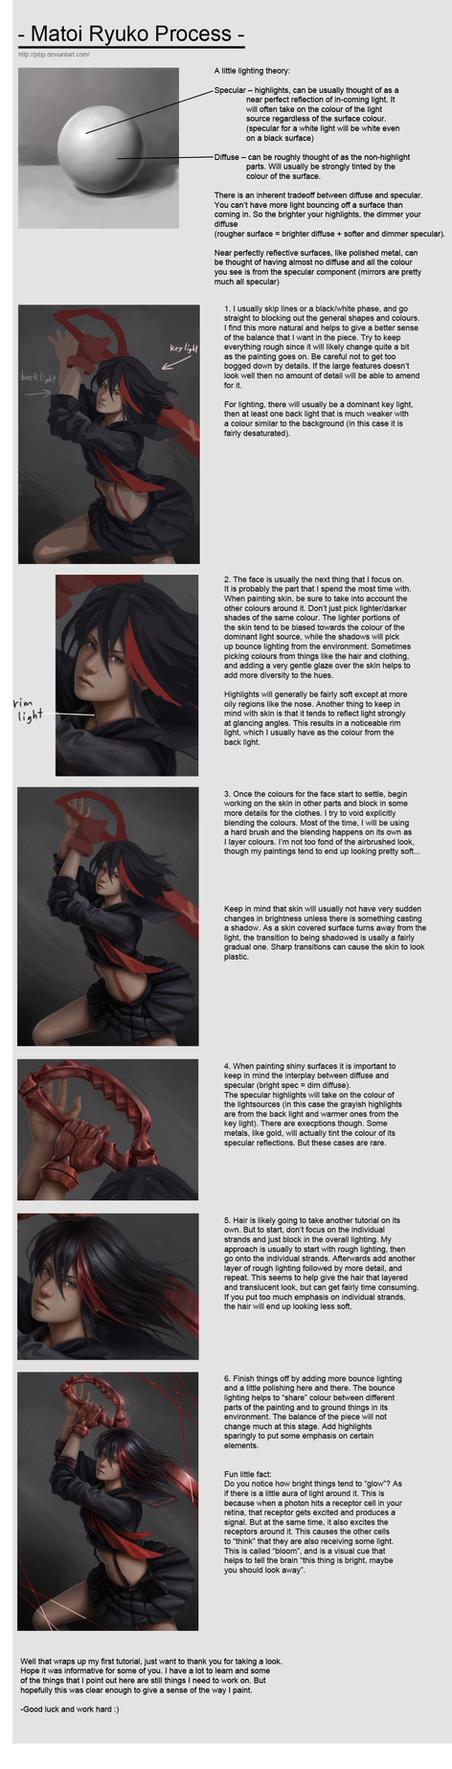 Ryuko Process by JxbP